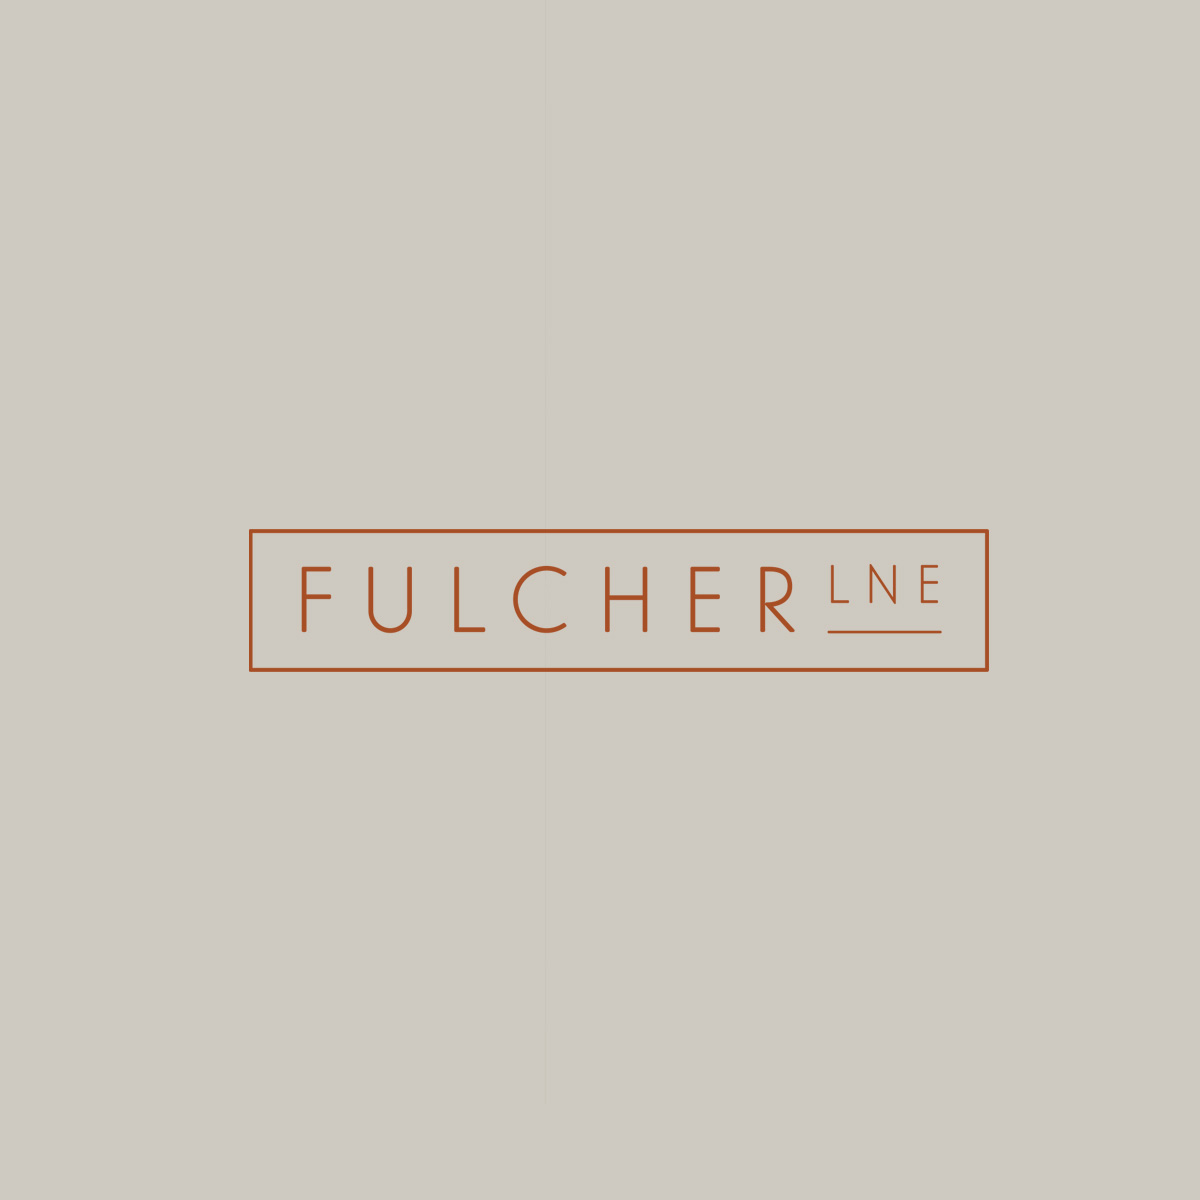 ALTR-FulcherLane-10